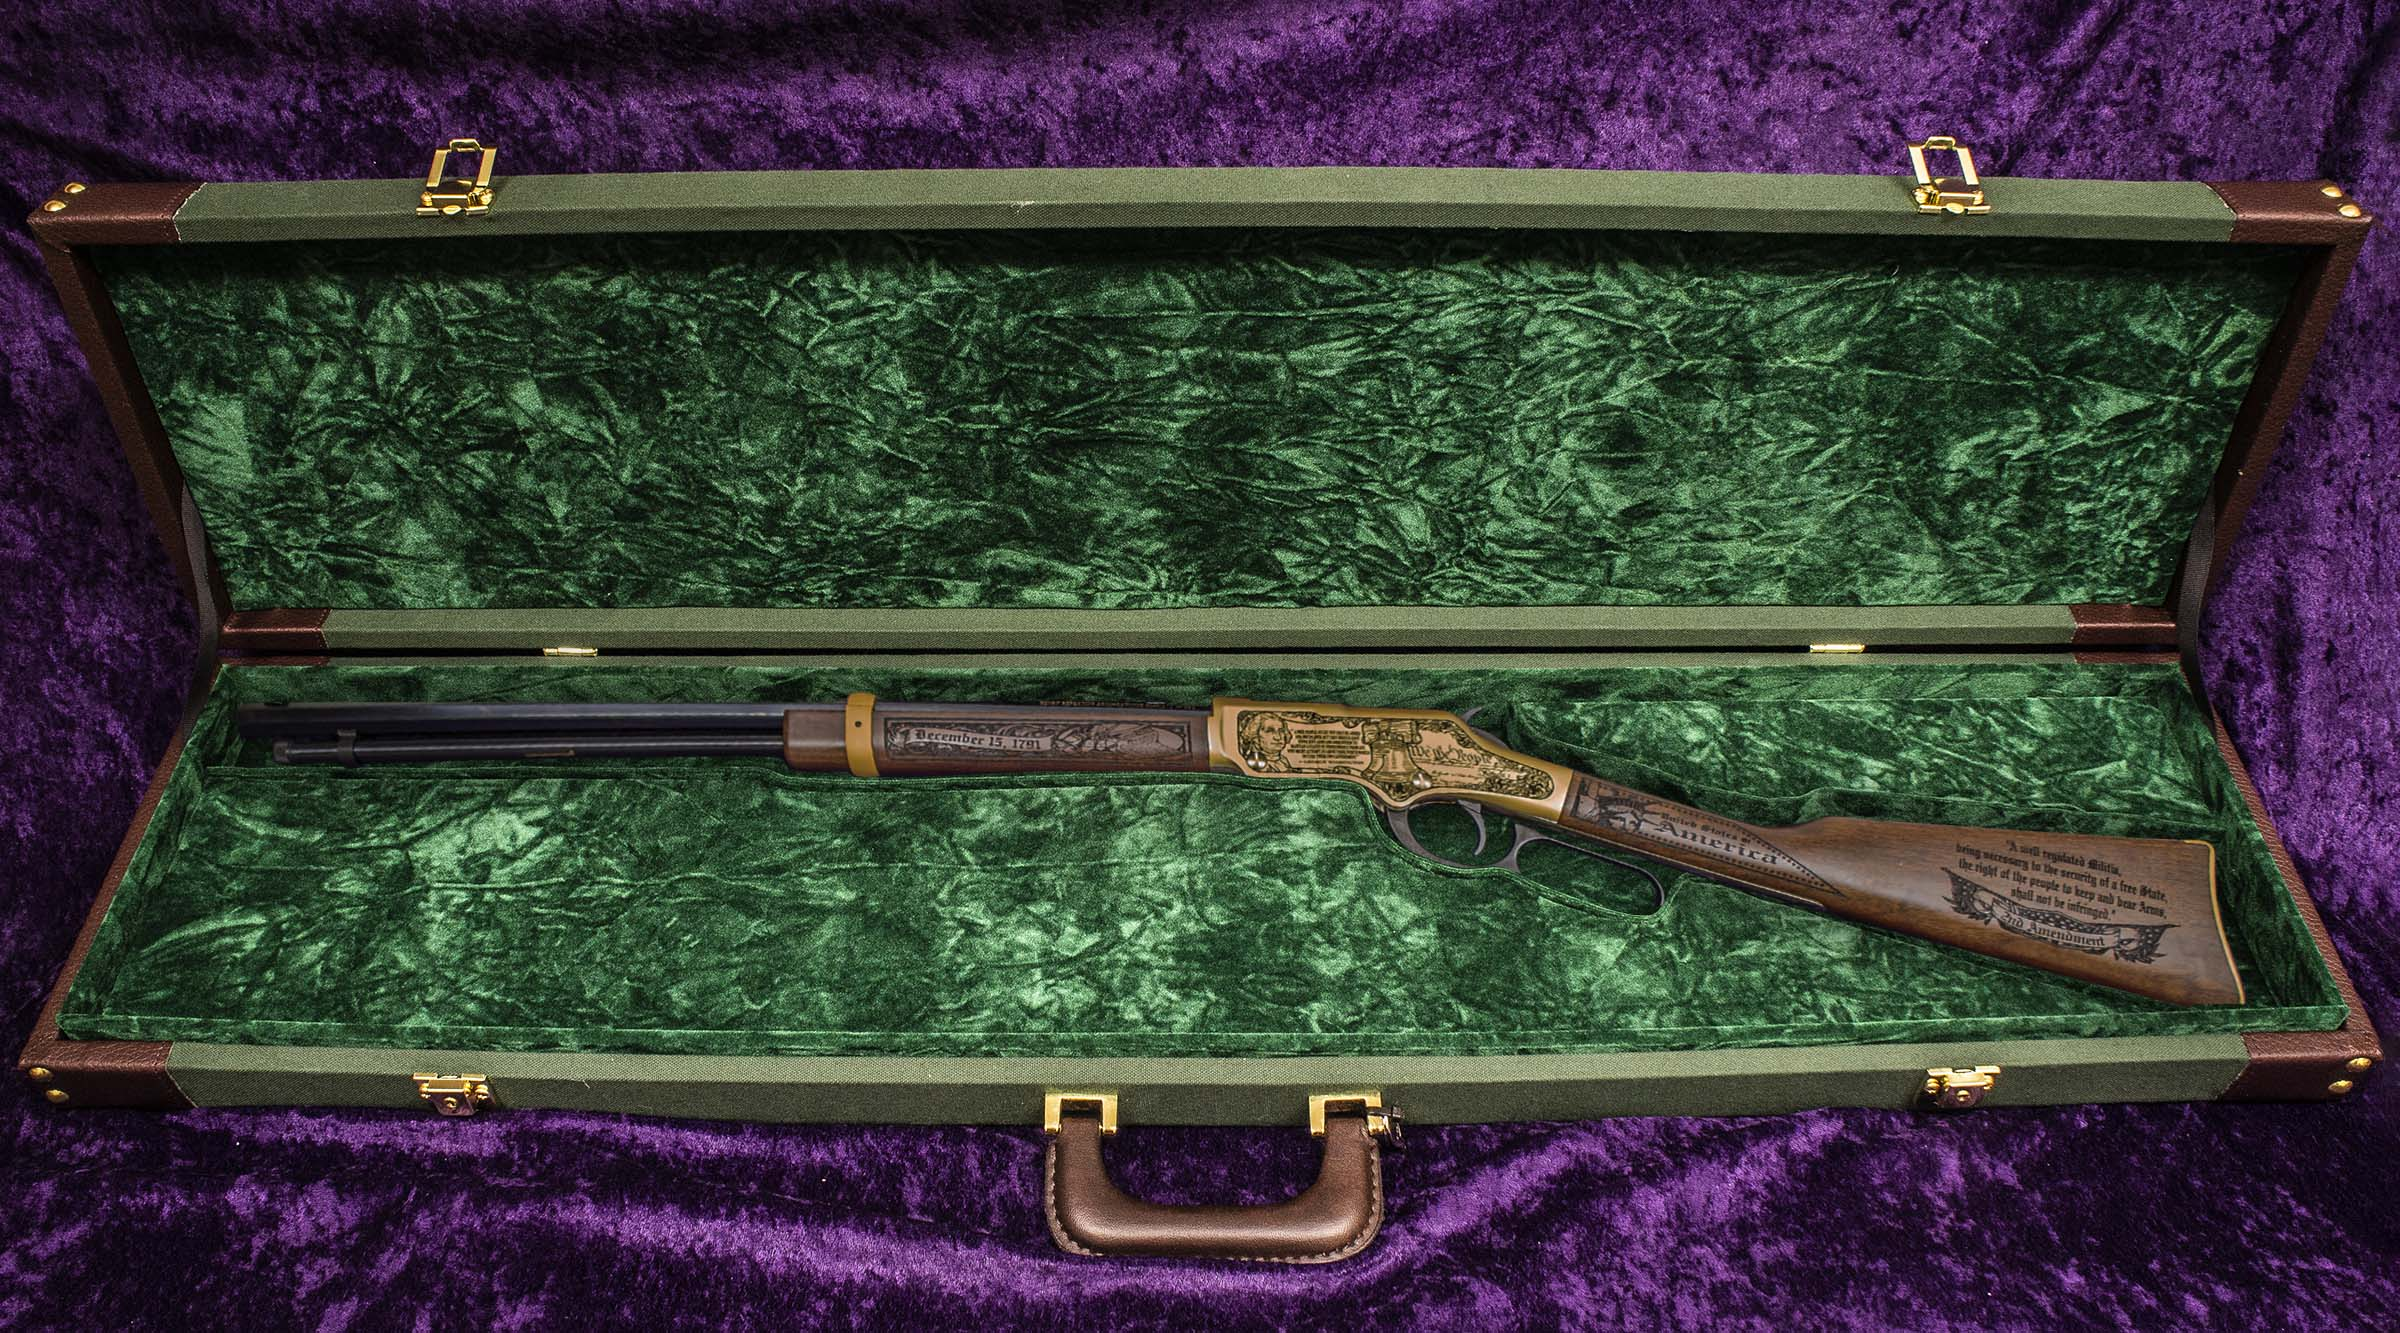 Henry Golden Boy 22 Green Case - Mock up gun inside.jpg